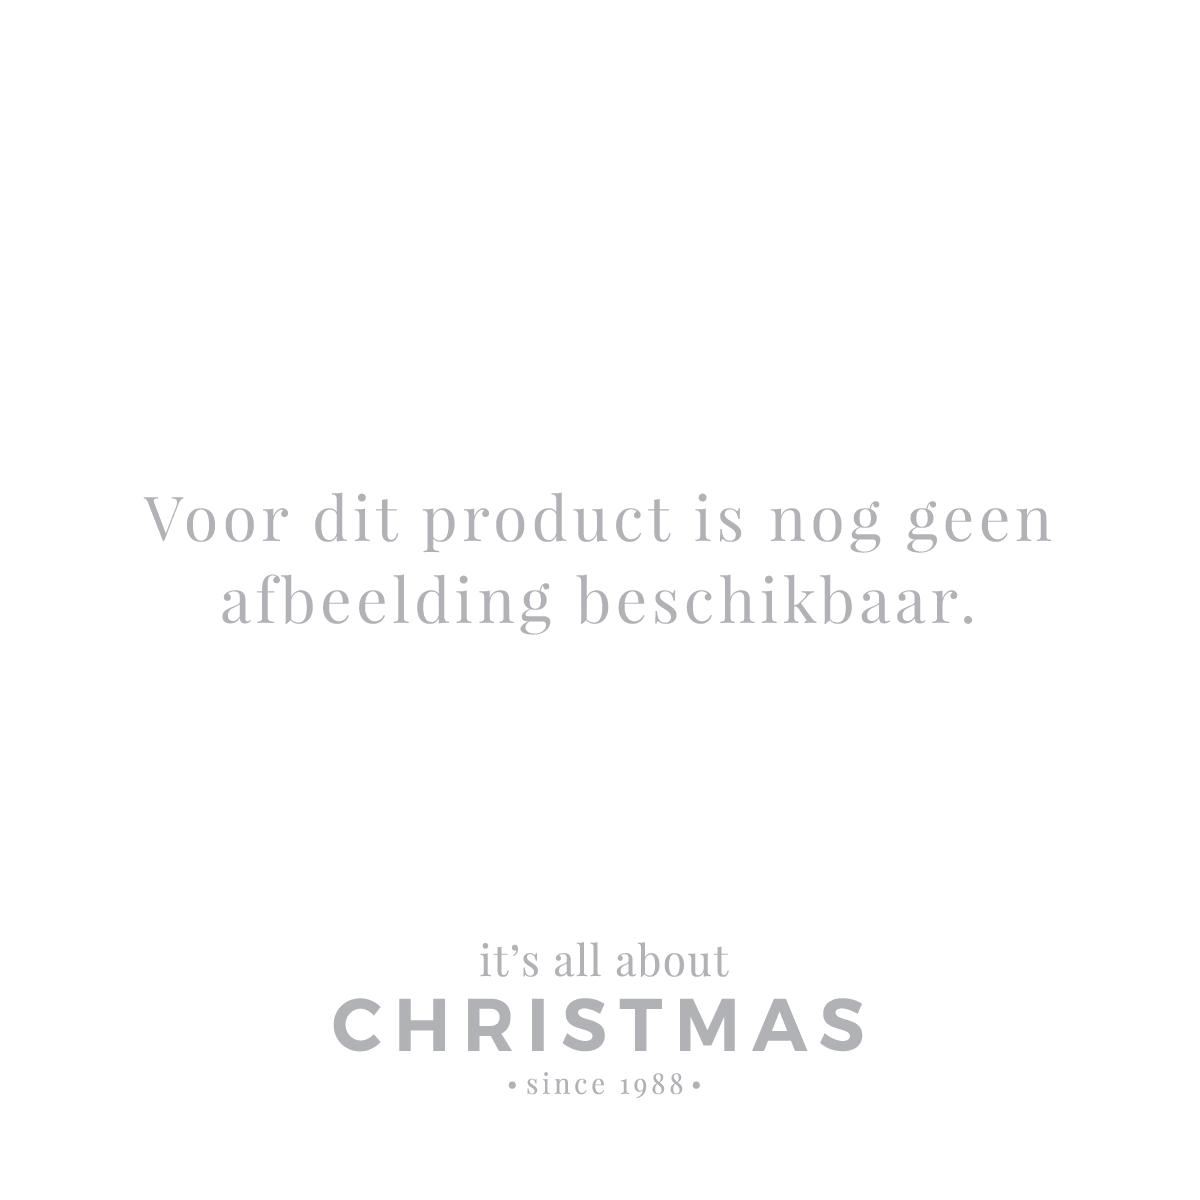 Christbaumkugeln Silber Matt.3 Christbaumkugeln Silber In Fensterbox It S All About Christmas